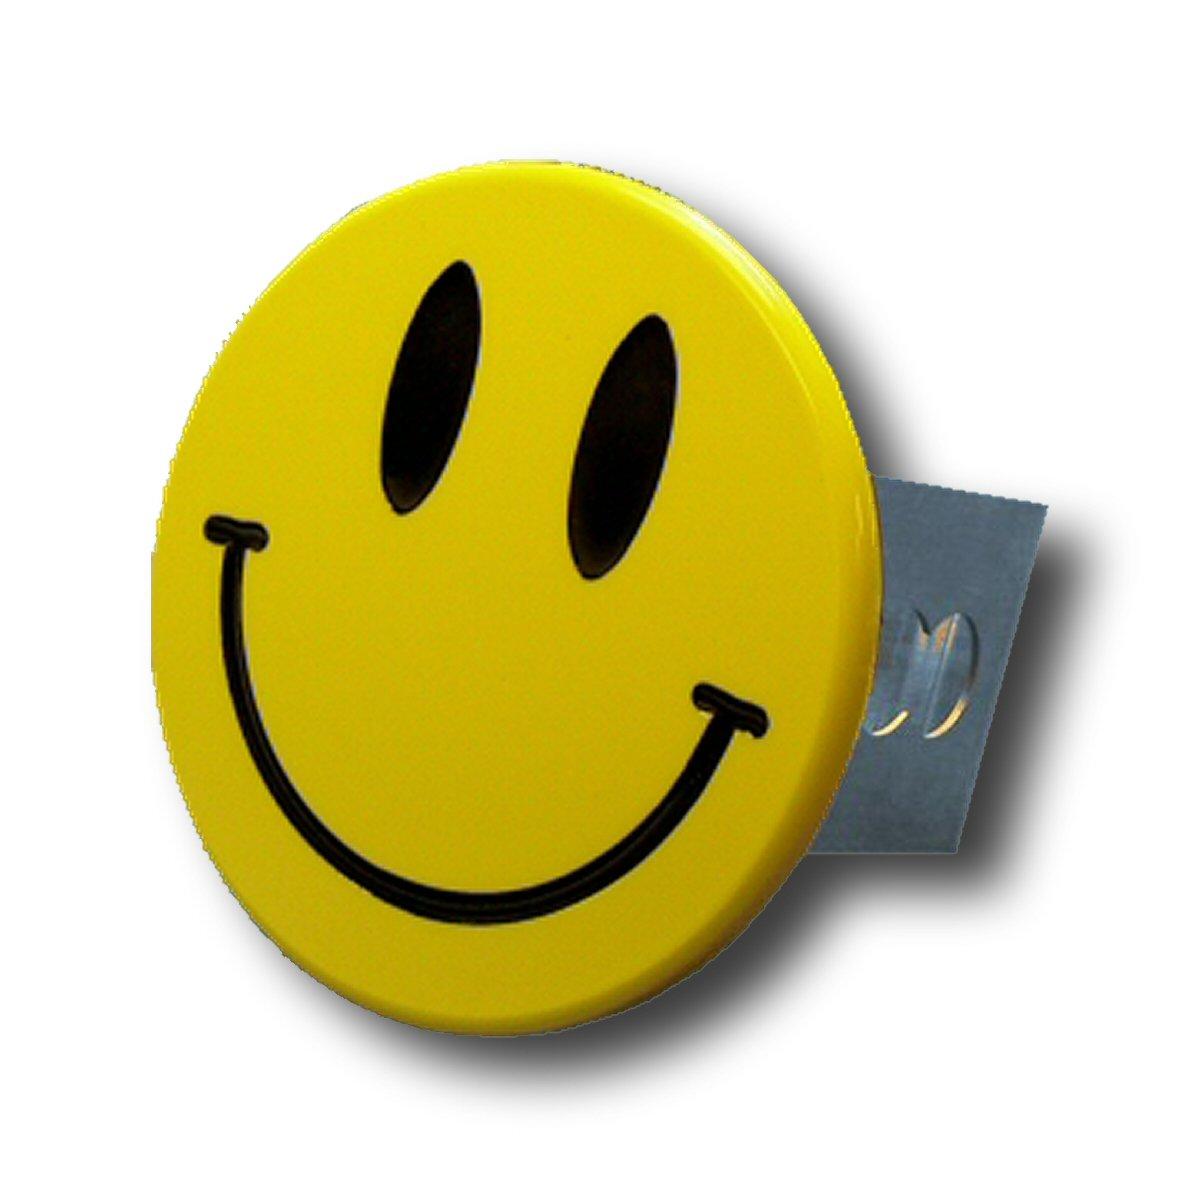 Smile Face Chrome Trailer Hitch Plug by Au-tomotive Gold